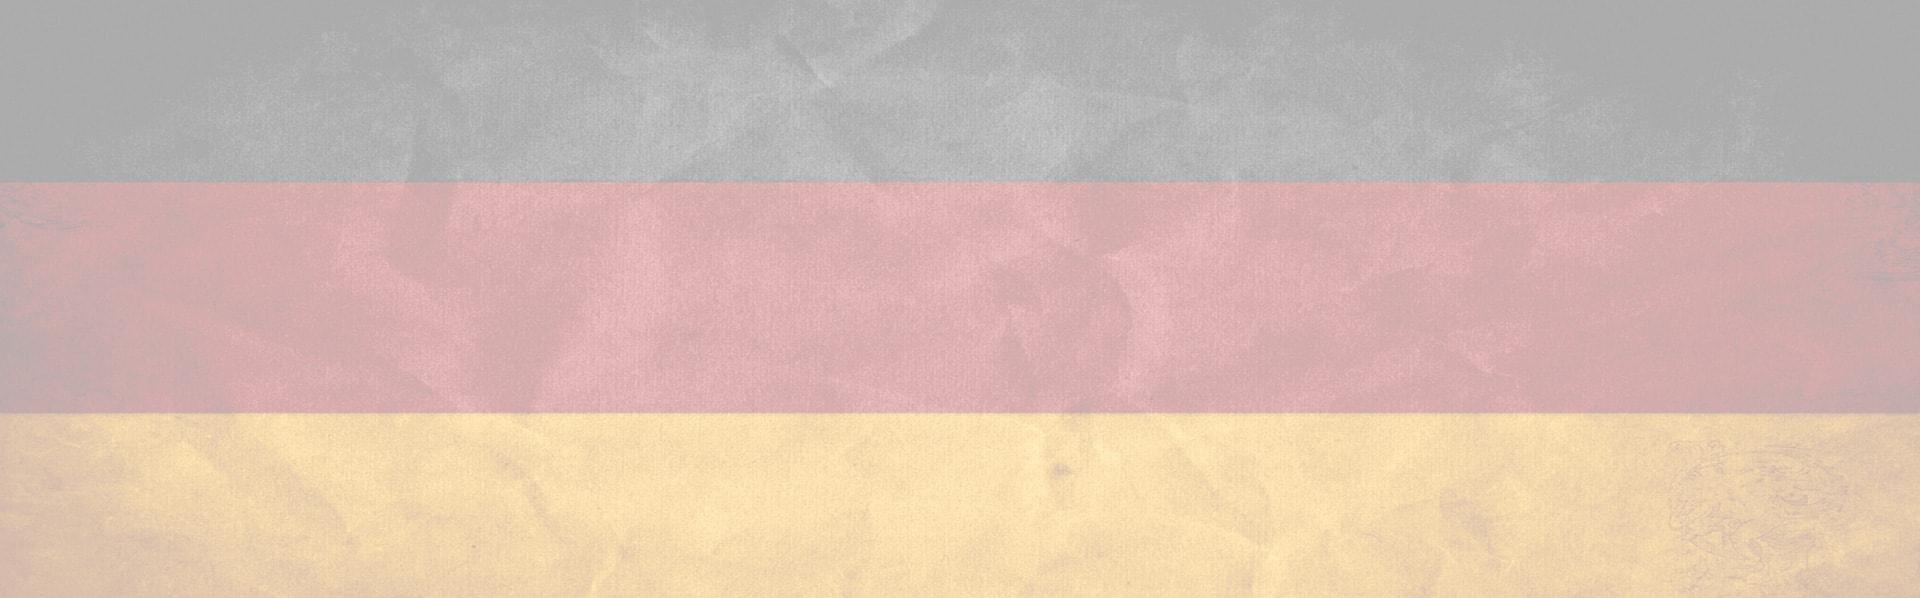 nemacka zastava